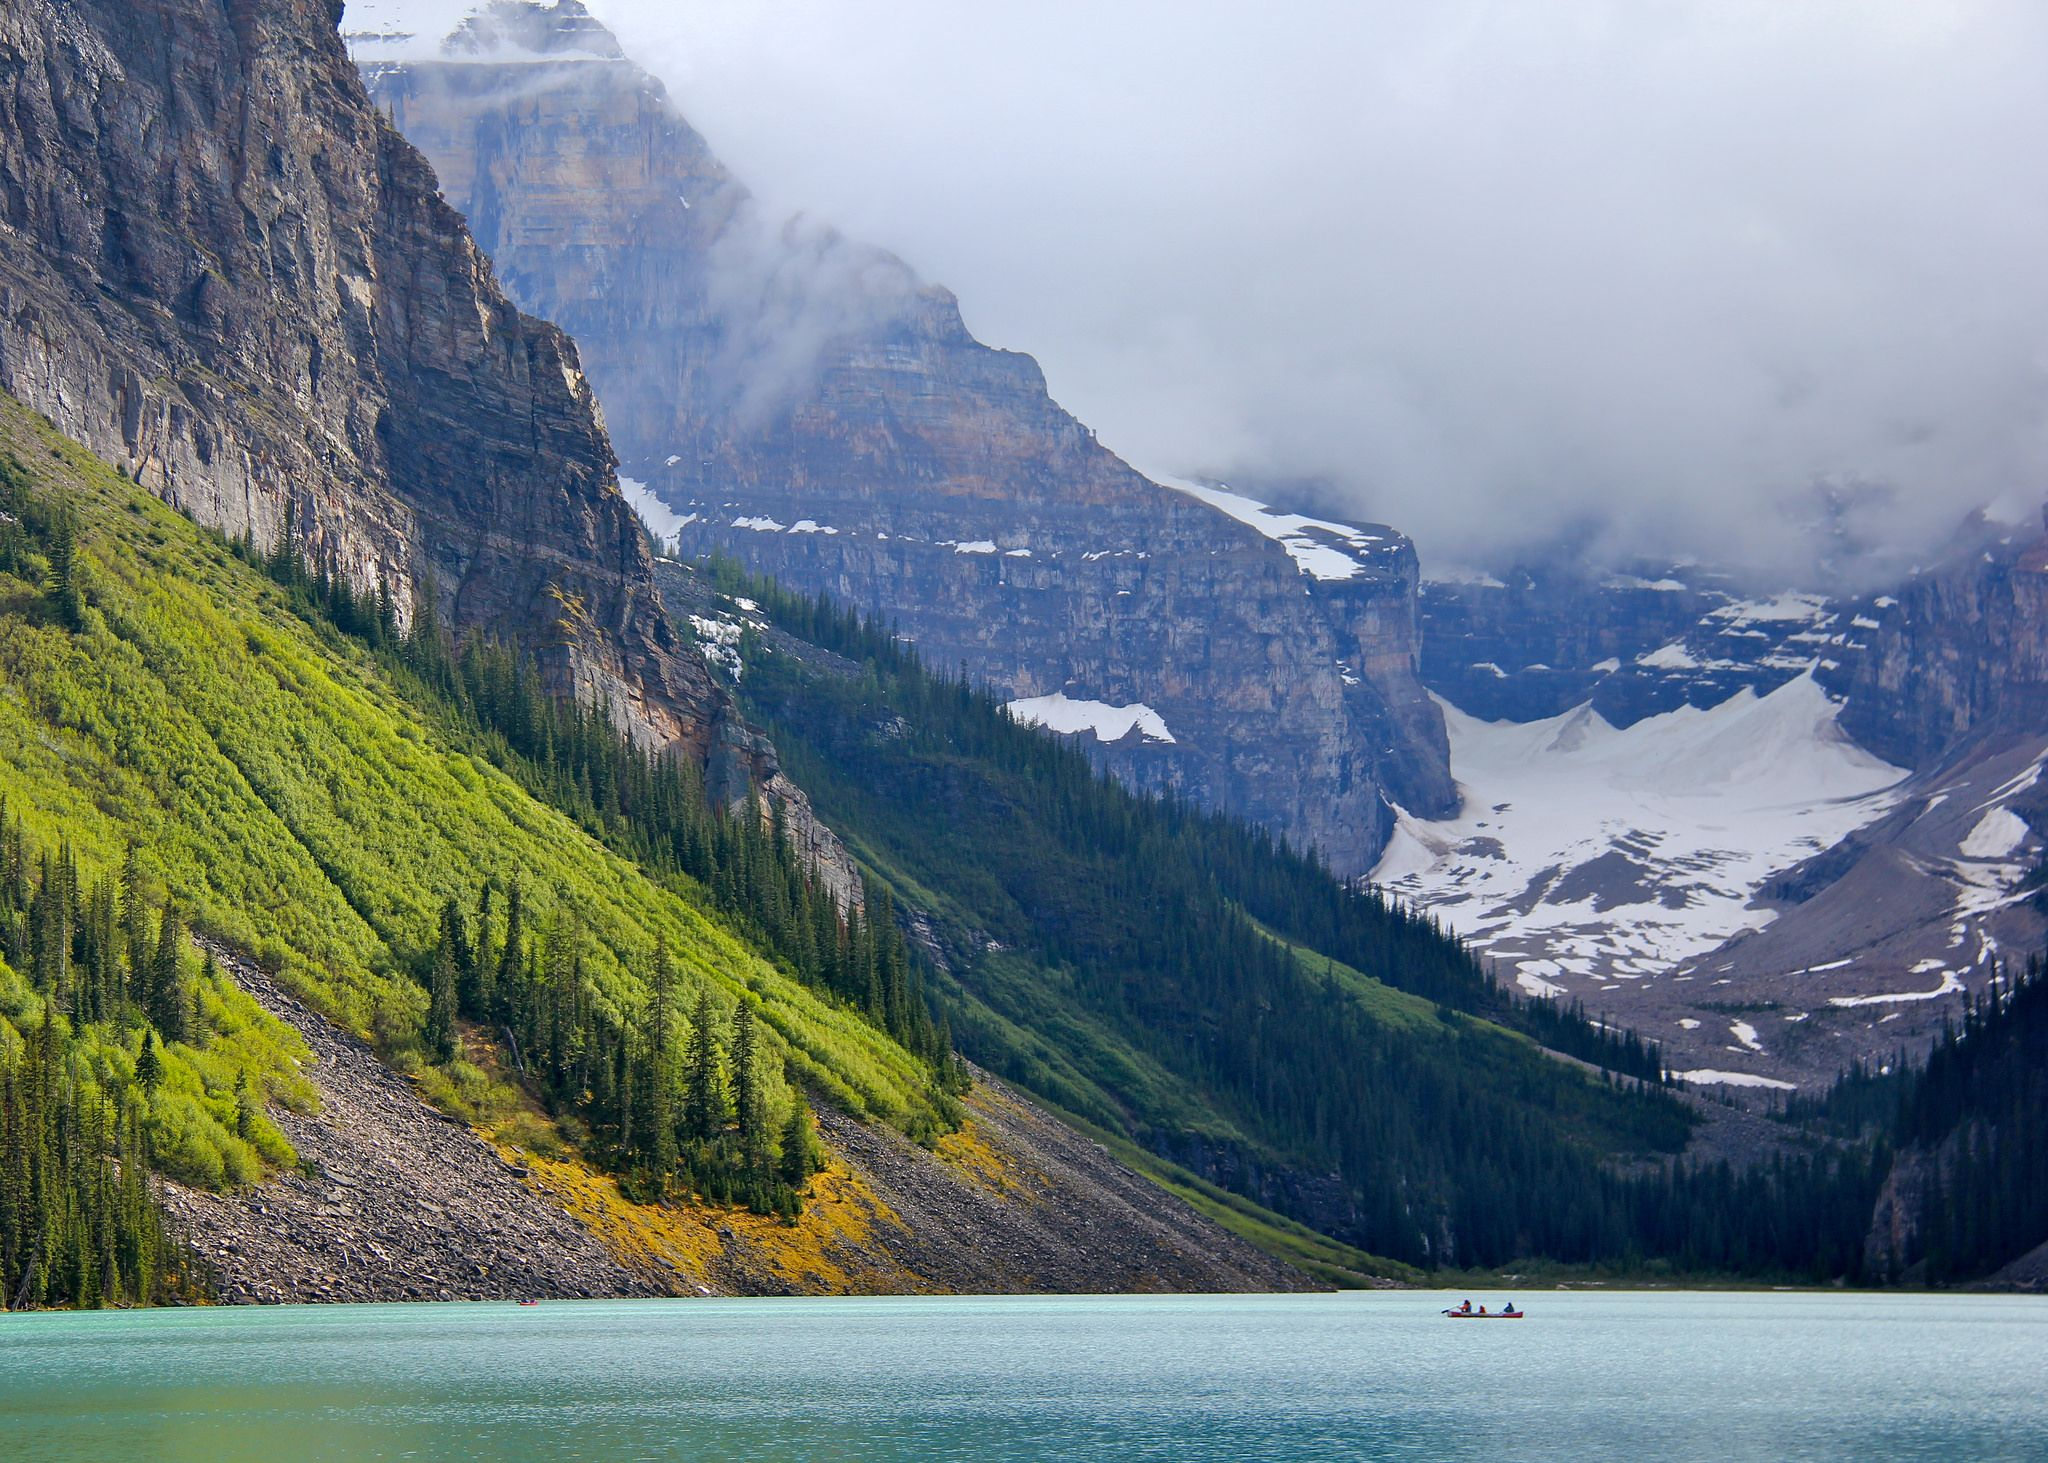 https://flic.kr/p/rcDpKz | Lake Louise 2012 No. 2 | Lake Louise, Canadian Rockies, Alberta, Canada, June 2012